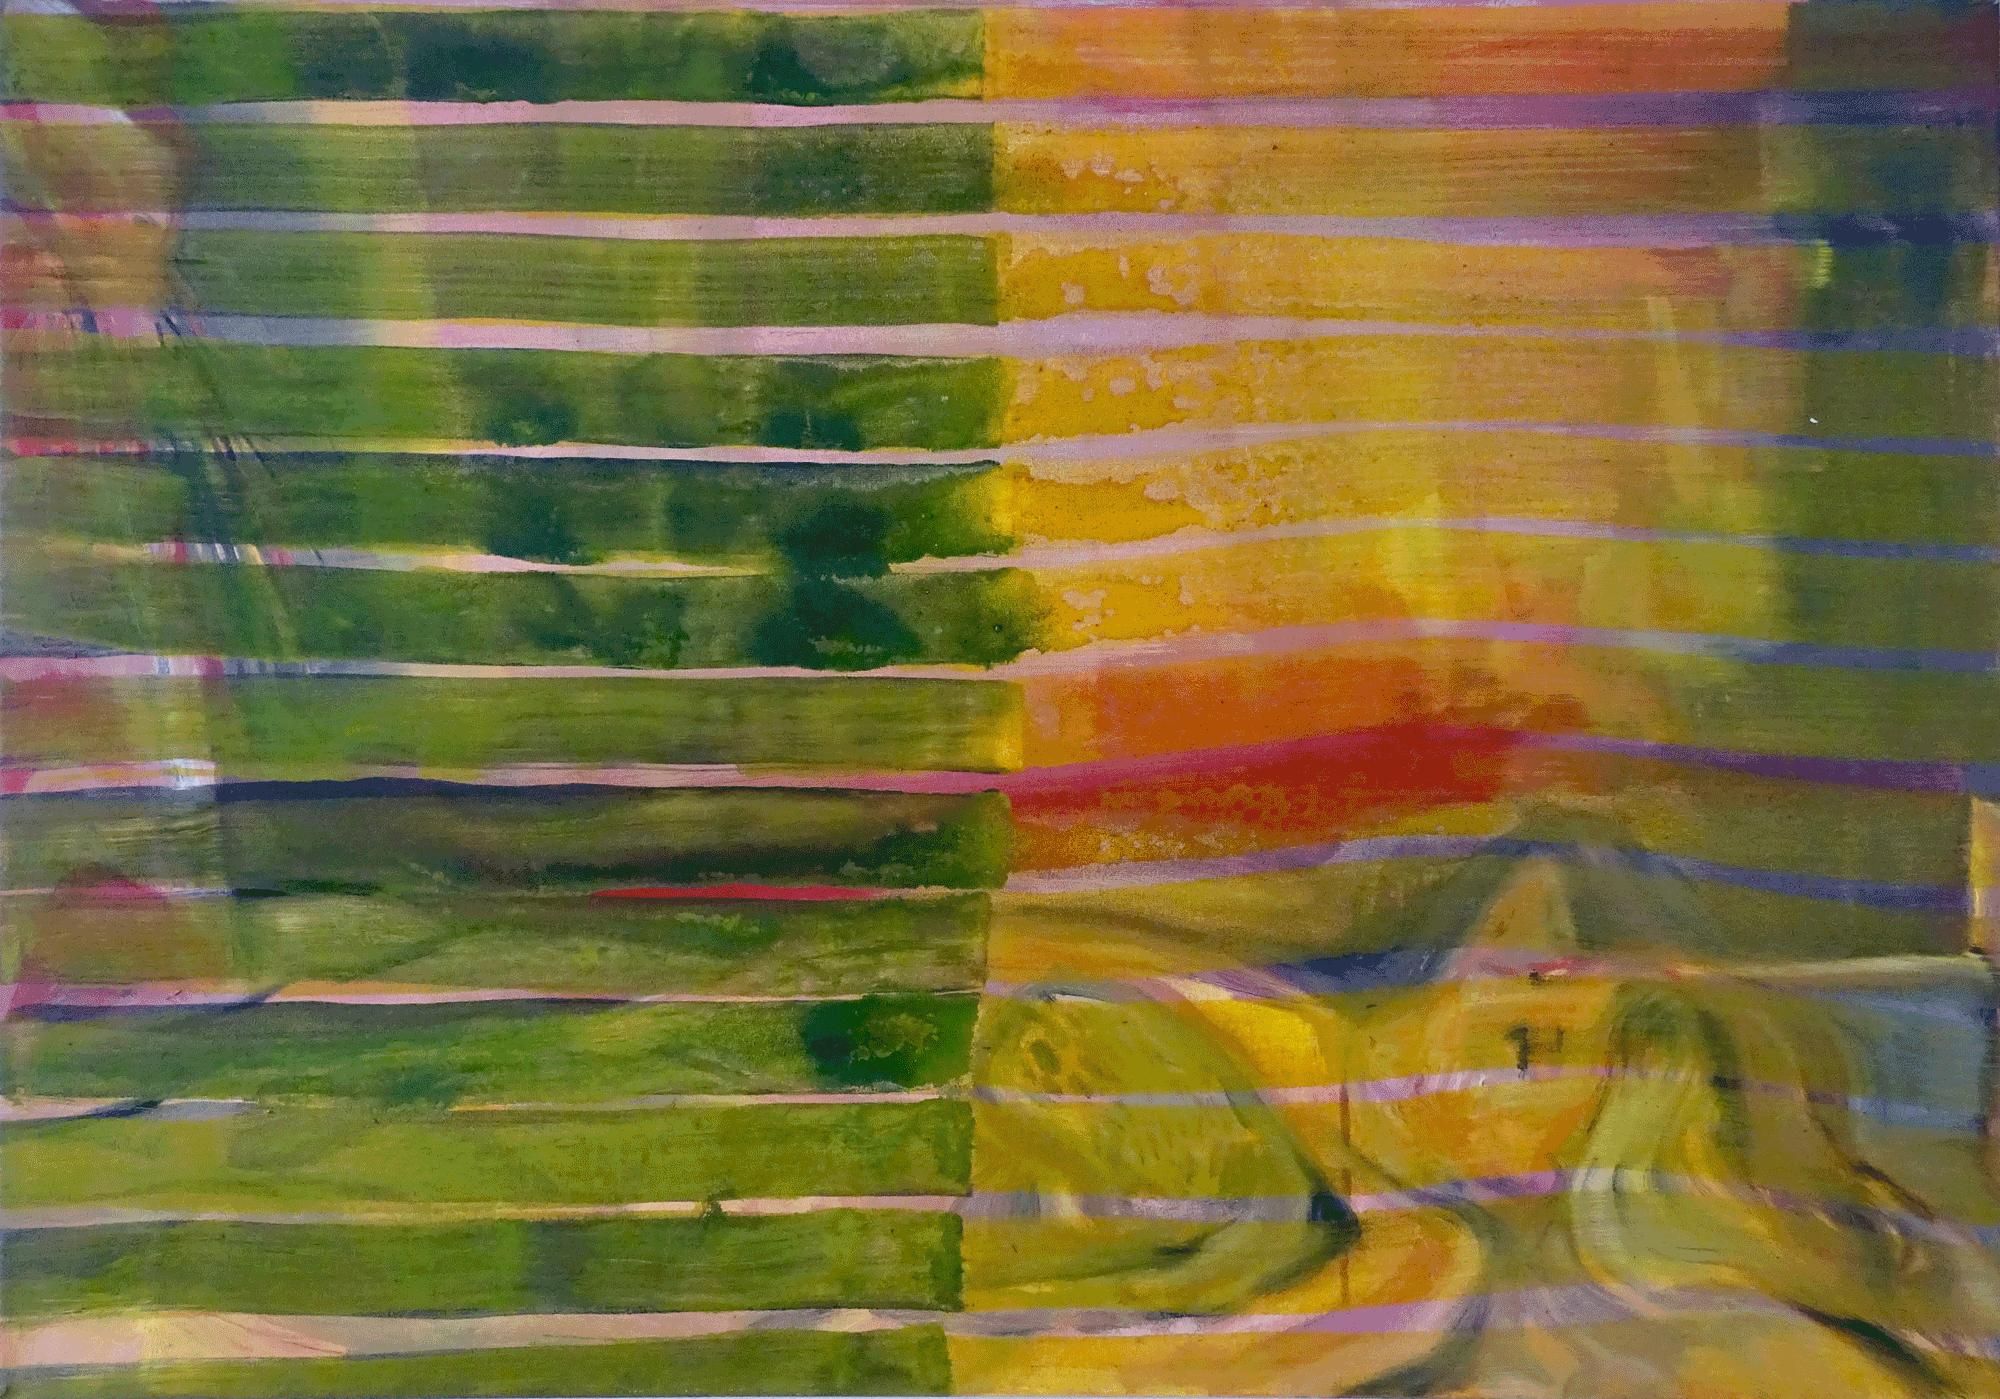 Yvonne Andreini, Yuka Mathilde, 2019, 70 x 100 cm, Tusche und Acryl auf Leinwand